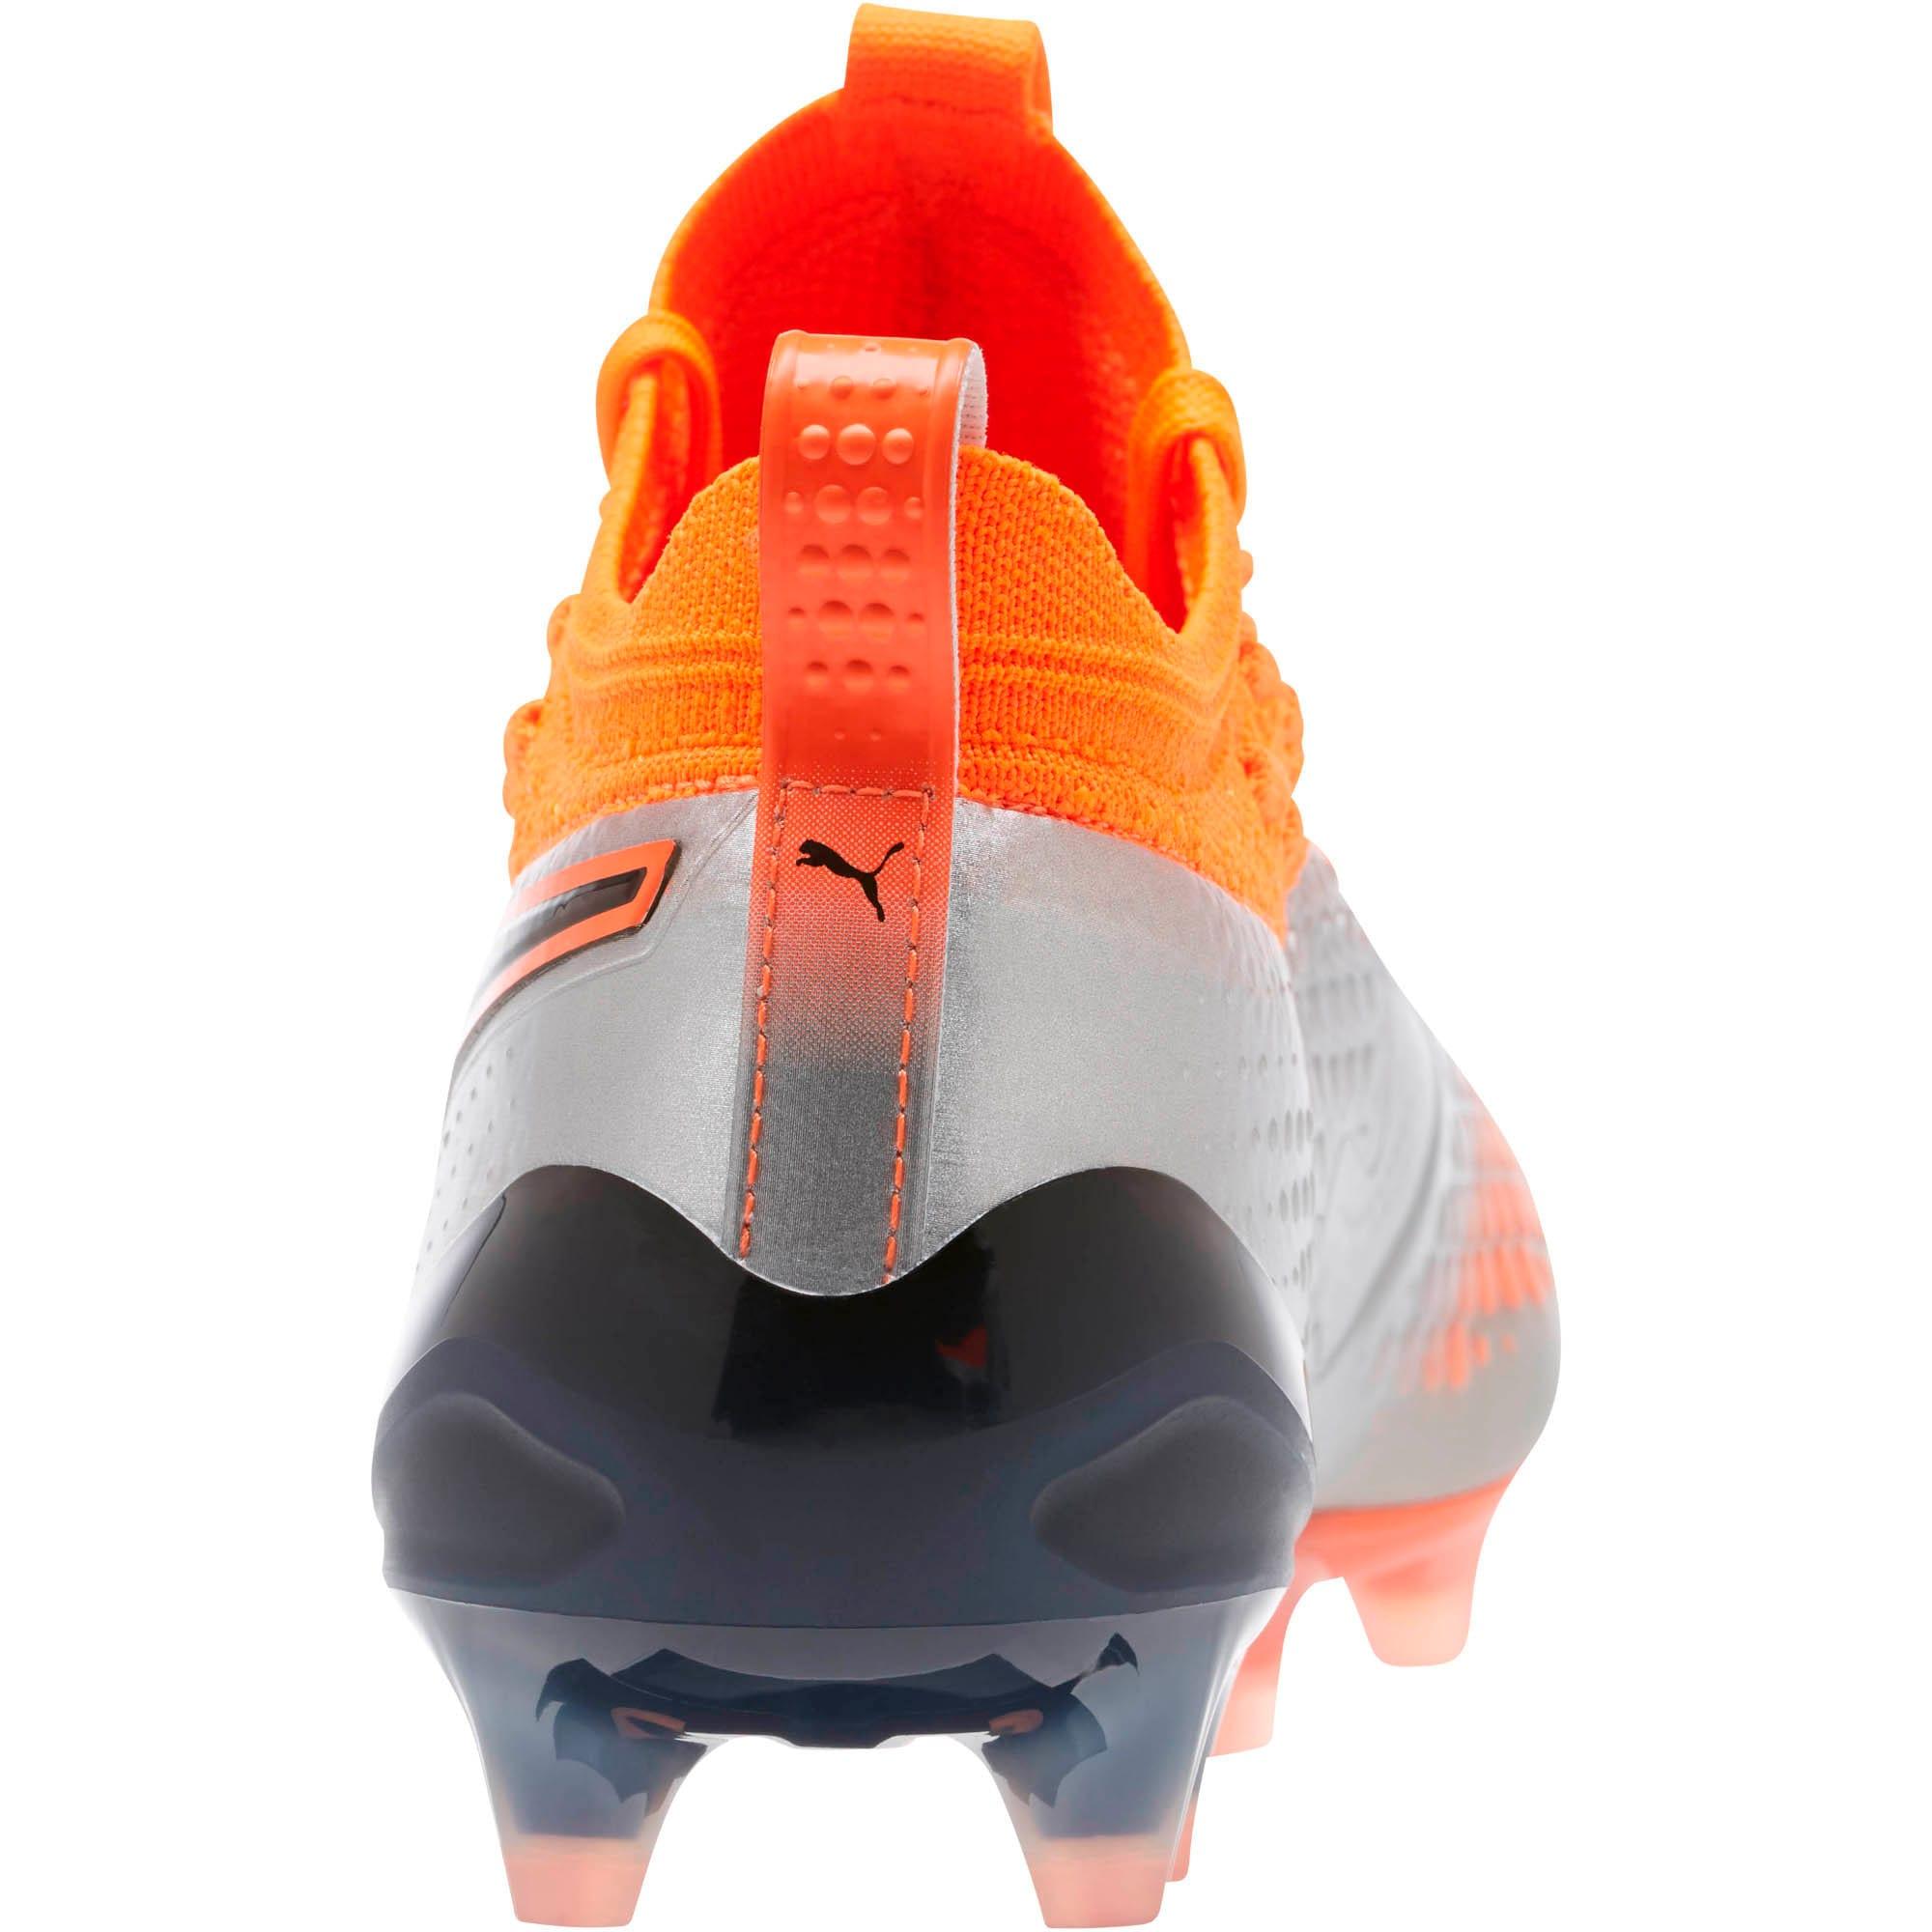 Thumbnail 4 of PUMA ONE 1 FG/AG Men's Soccer Cleats, Silver-Orange-Black, medium